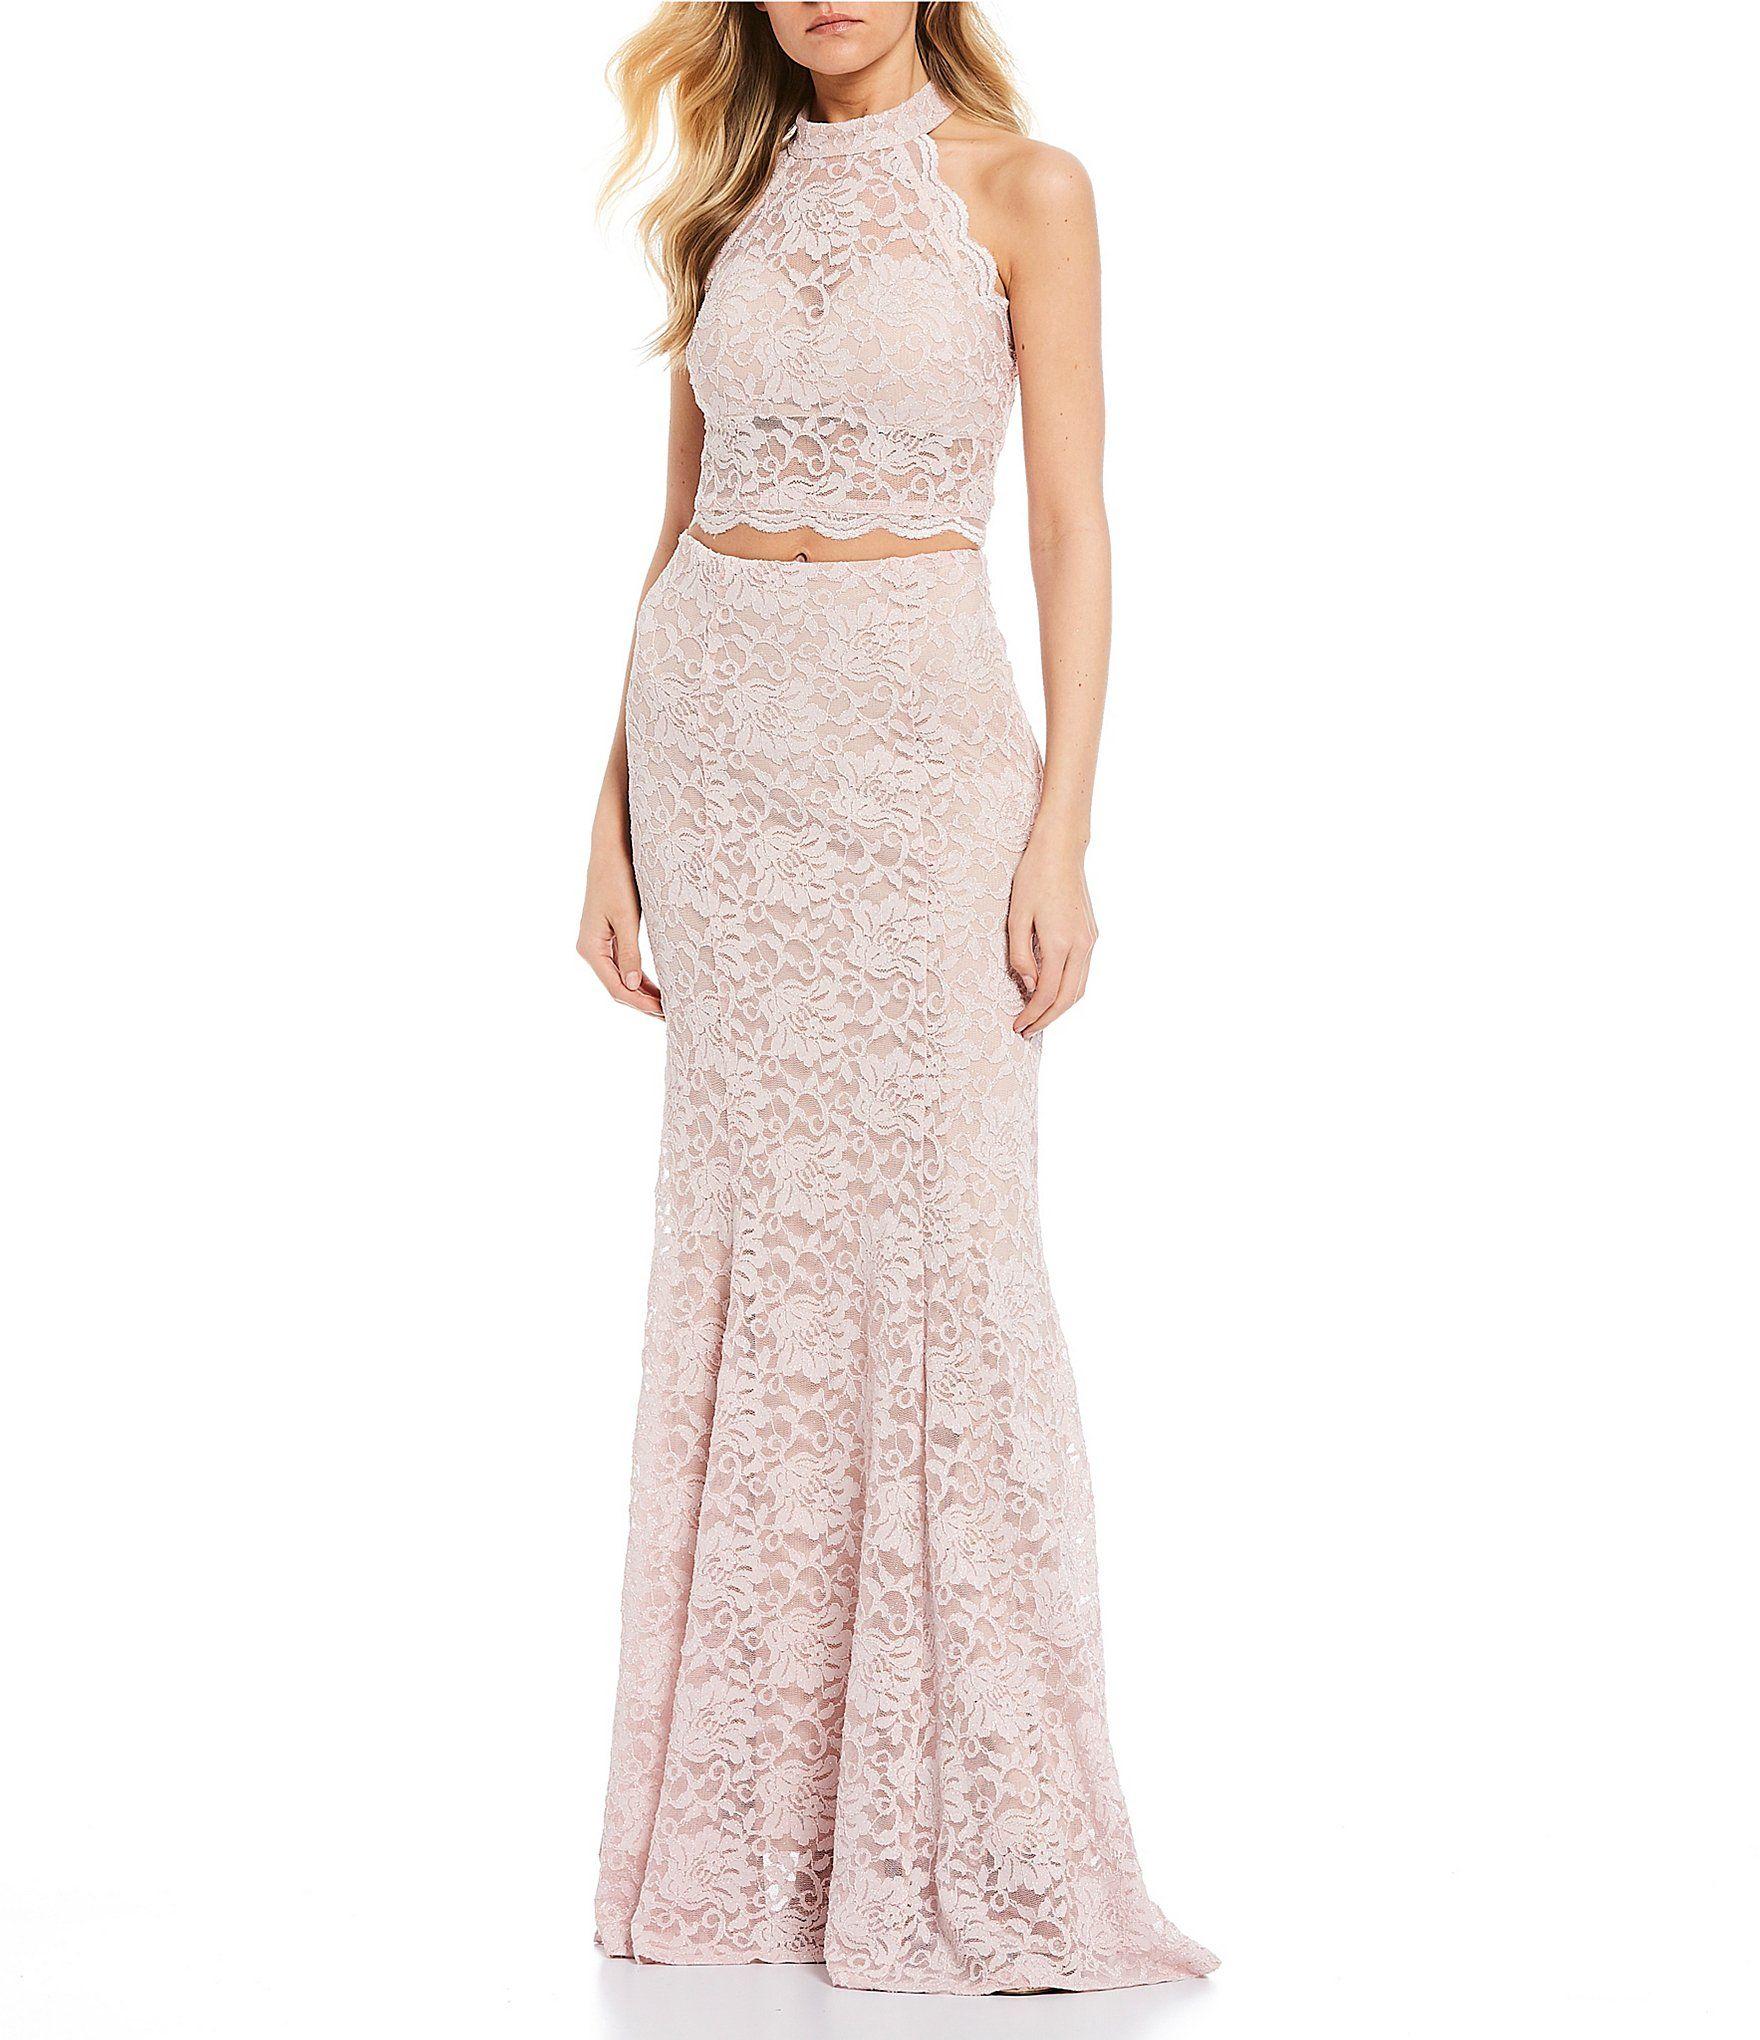 Sequin Hearts Mock Neck Glitter Lace Two Piece Long Dress Dillard S Two Piece Long Dress Long Dress Dresses [ 2040 x 1760 Pixel ]